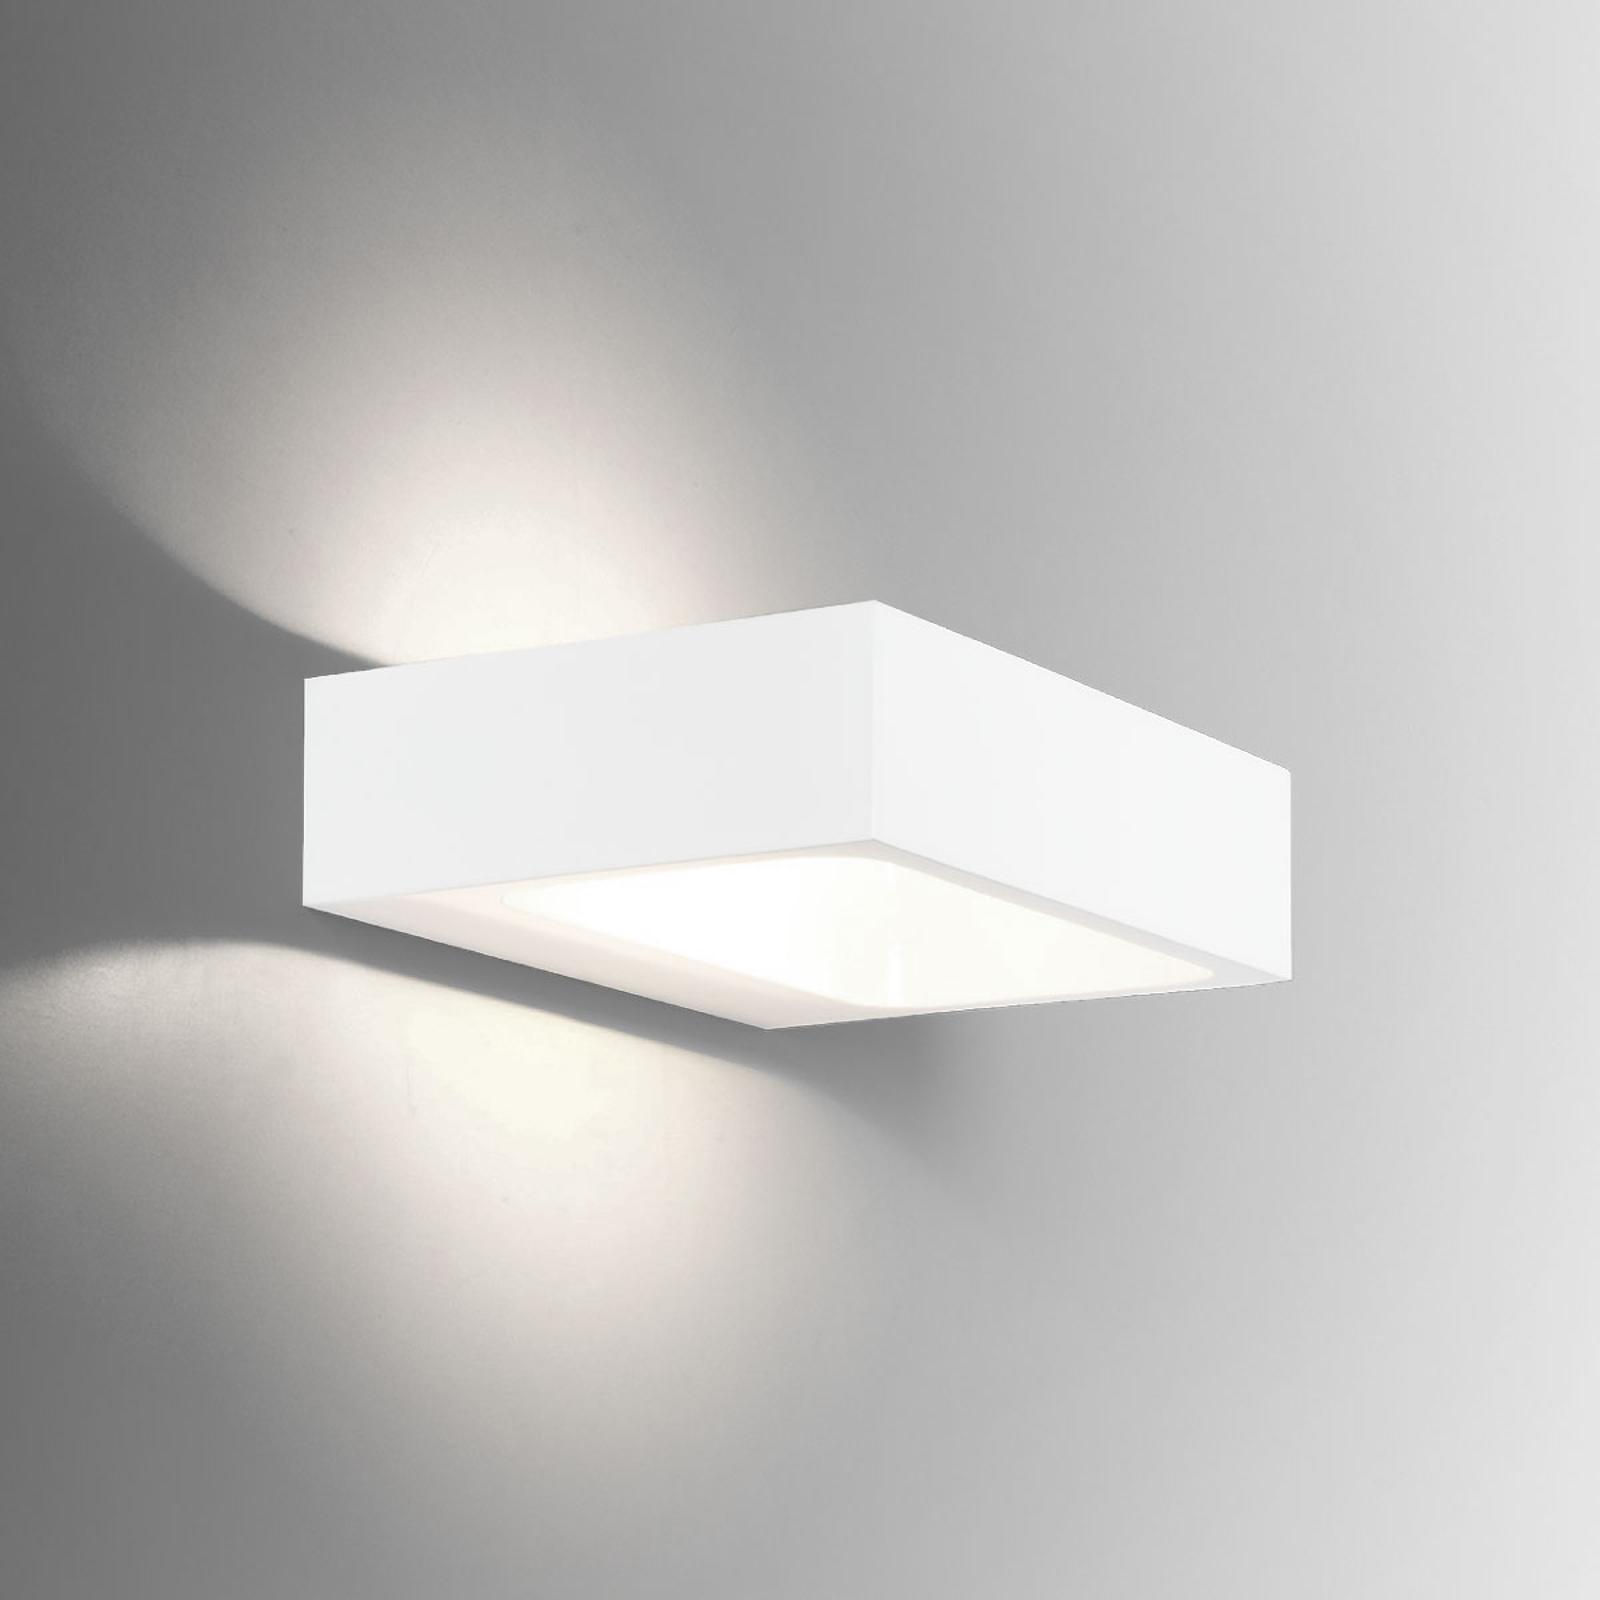 WEVER & DUCRÉ Bento 1.3 LED-Wandleuchte weiß